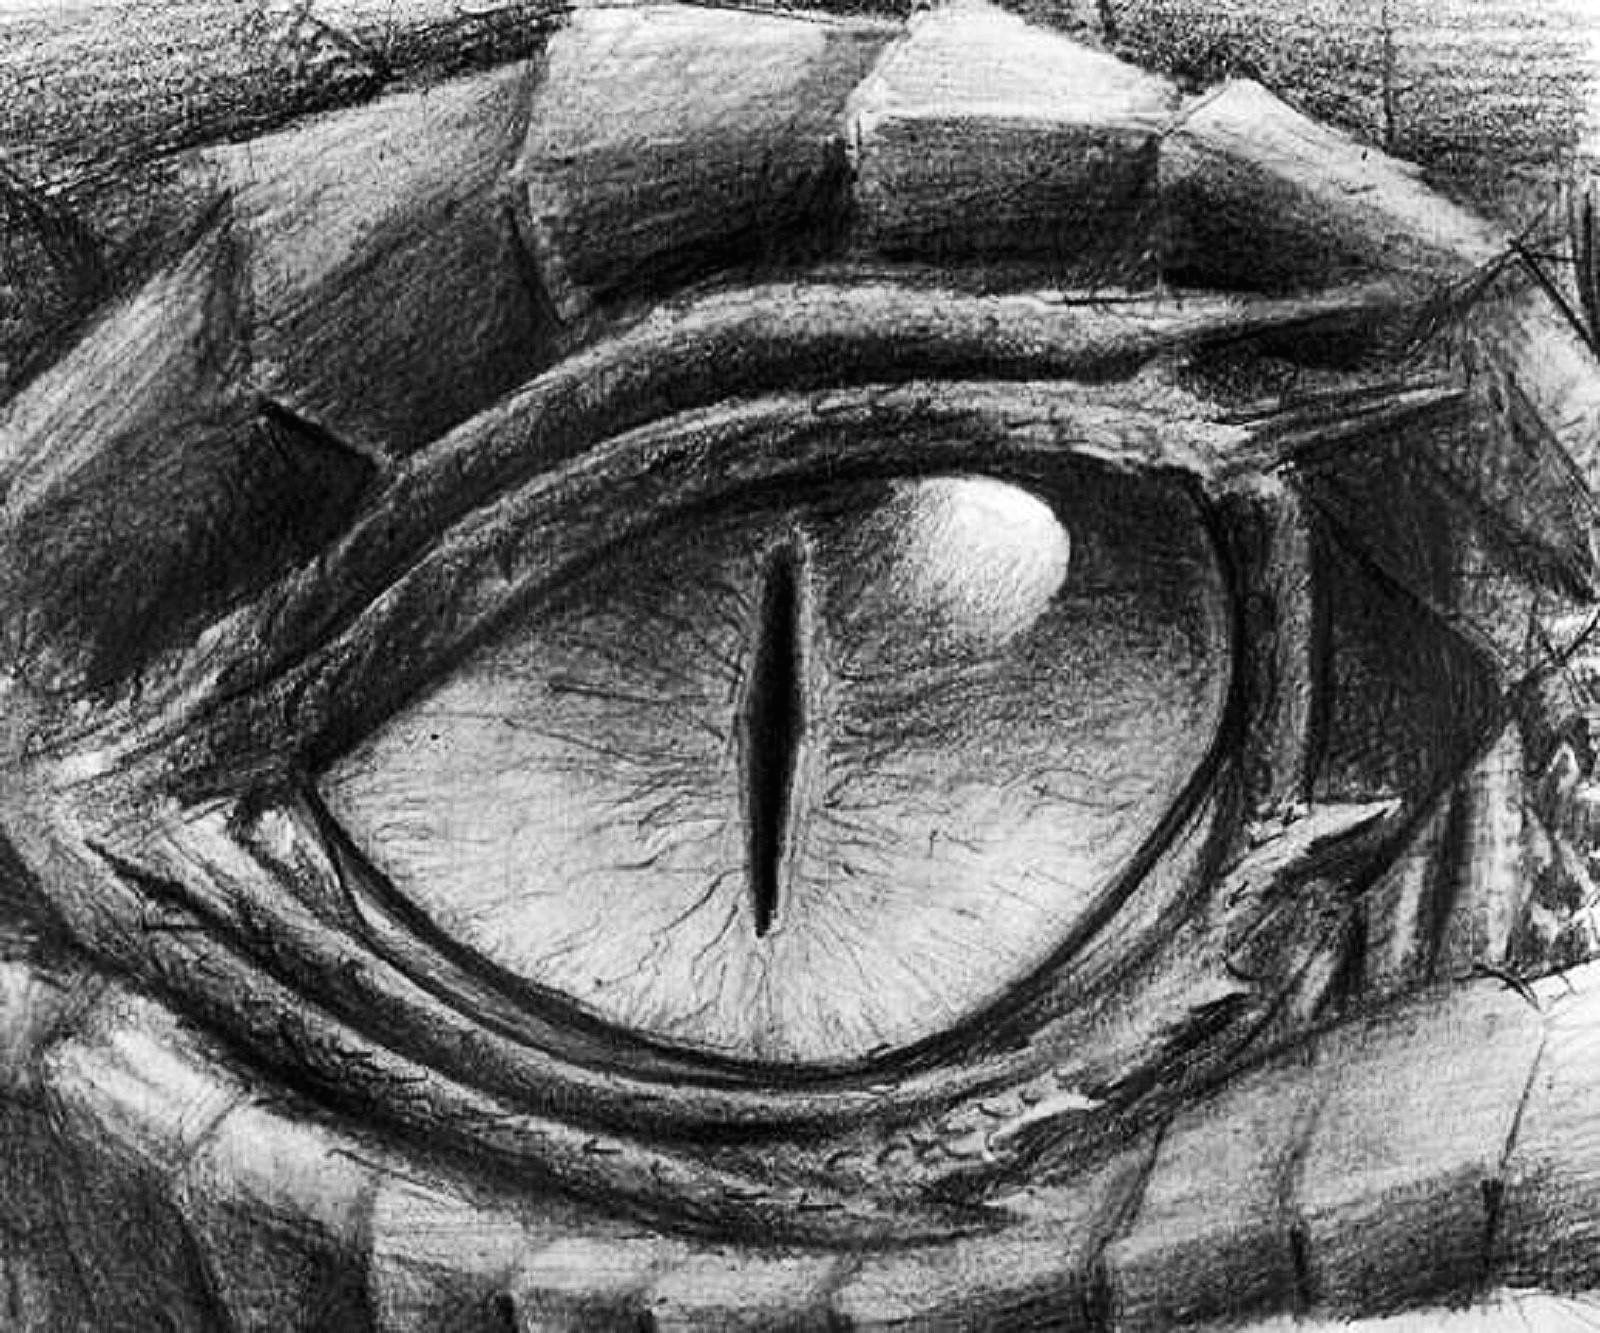 dragon eye drawing chinese dragon drawing simple dragon drawing dragon drawings dragon